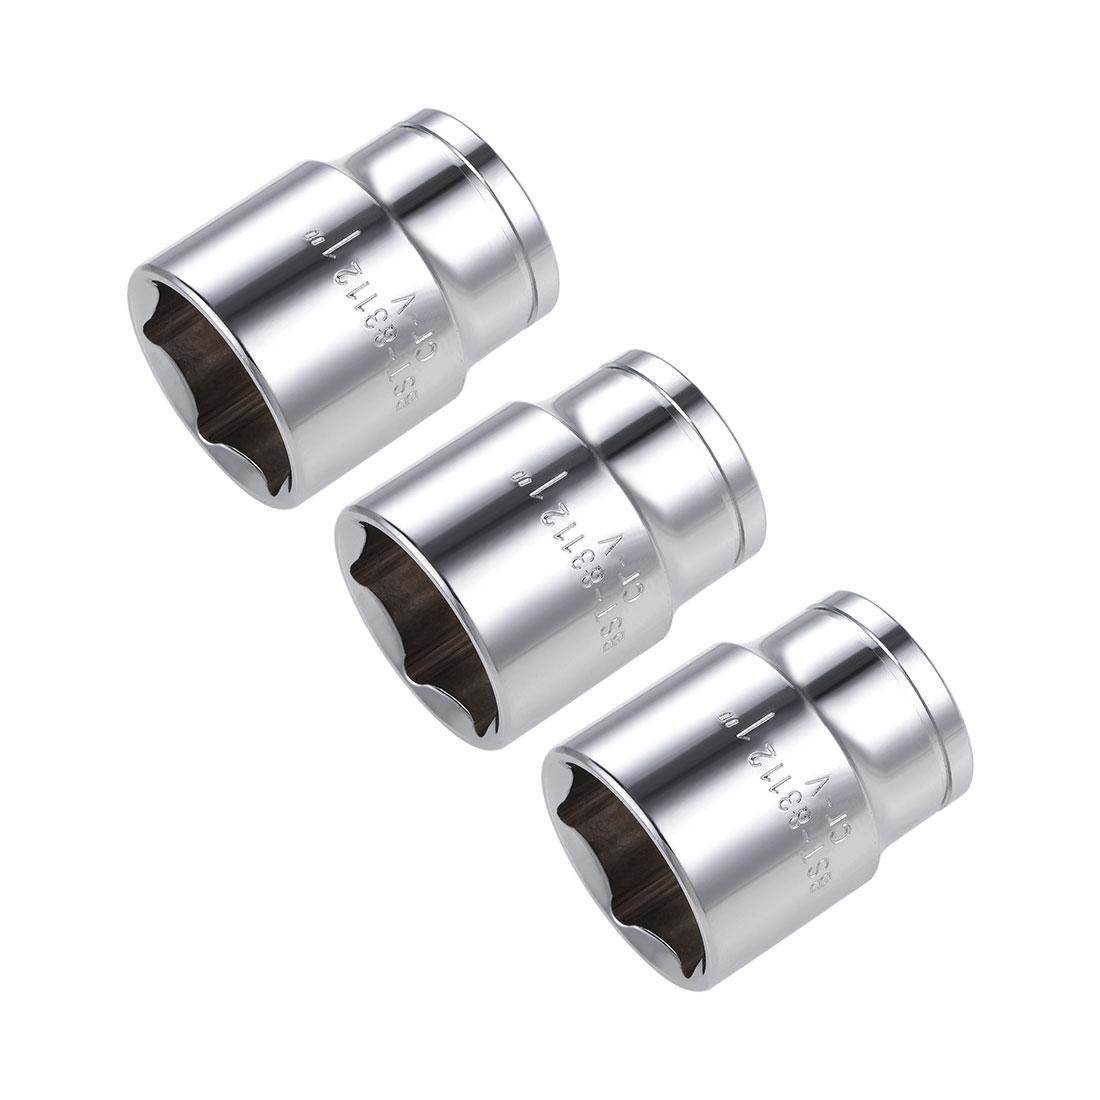 3 Pcs 1/2-inch Drive 1-inch 6-Point Shallow Socket, Cr-V